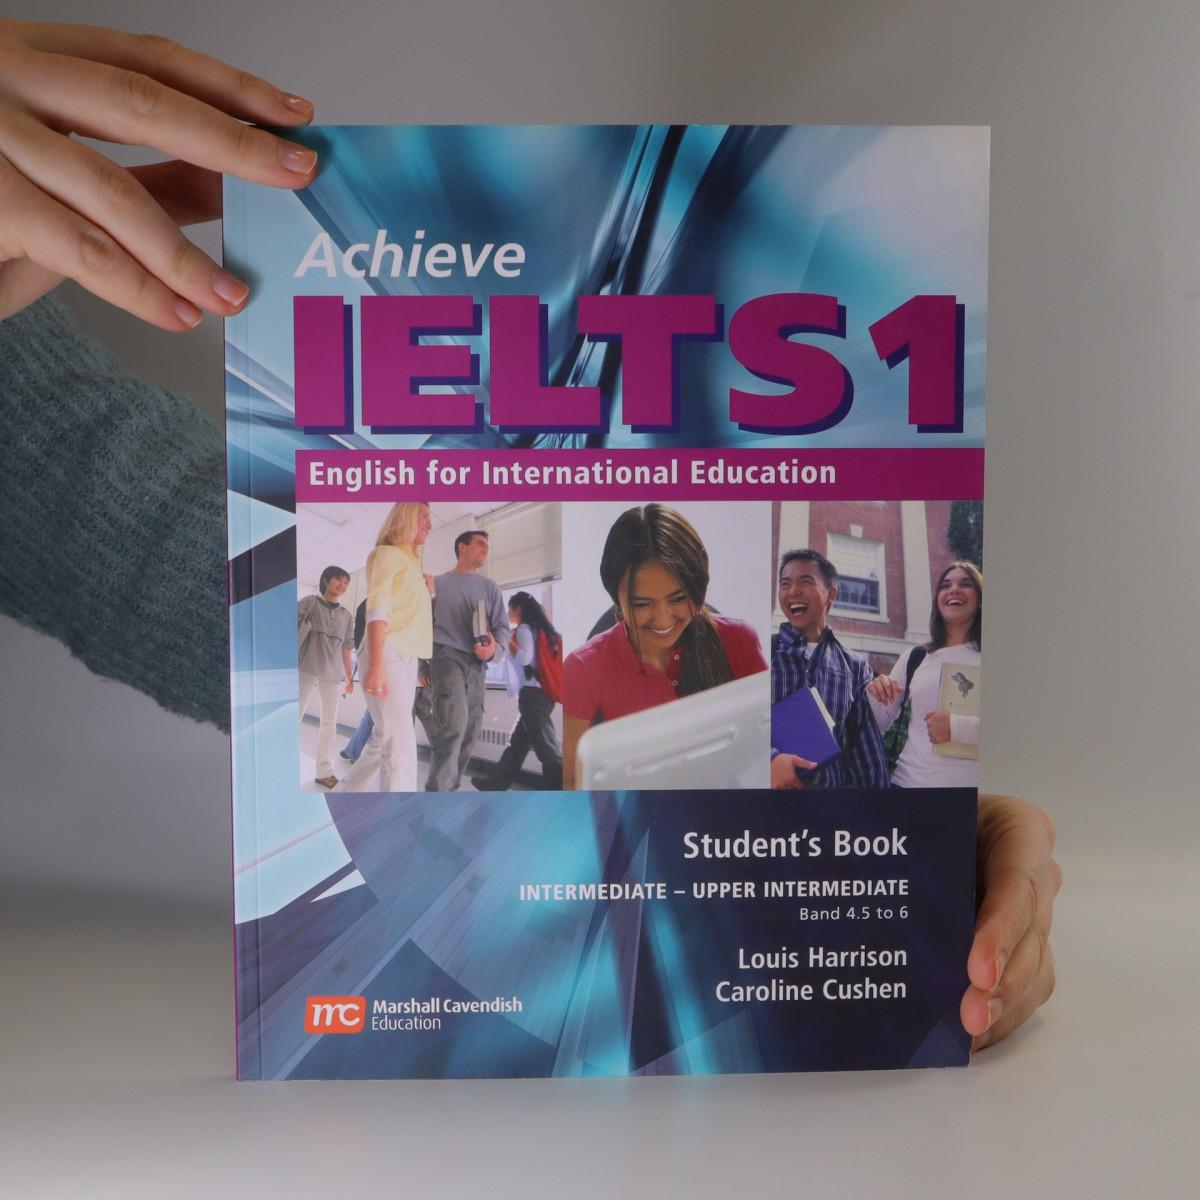 antikvární kniha Achieve IELTS English for international education, neuveden